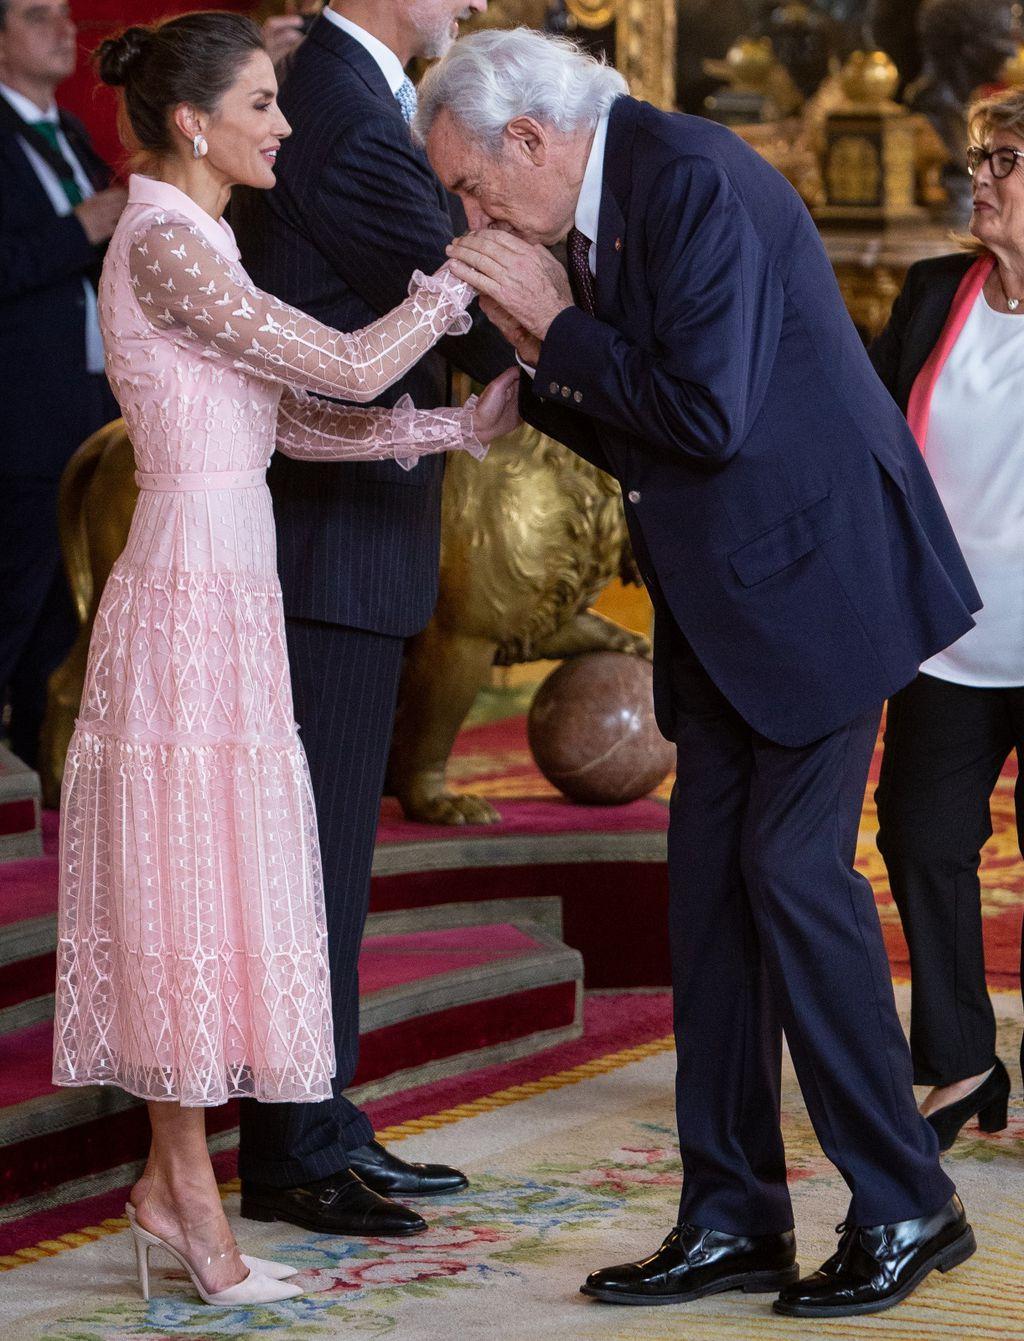 Kraljica Letizia u ružičastoj \'bombon\' haljini španjolskog dizajnera Felipea Varela - 6